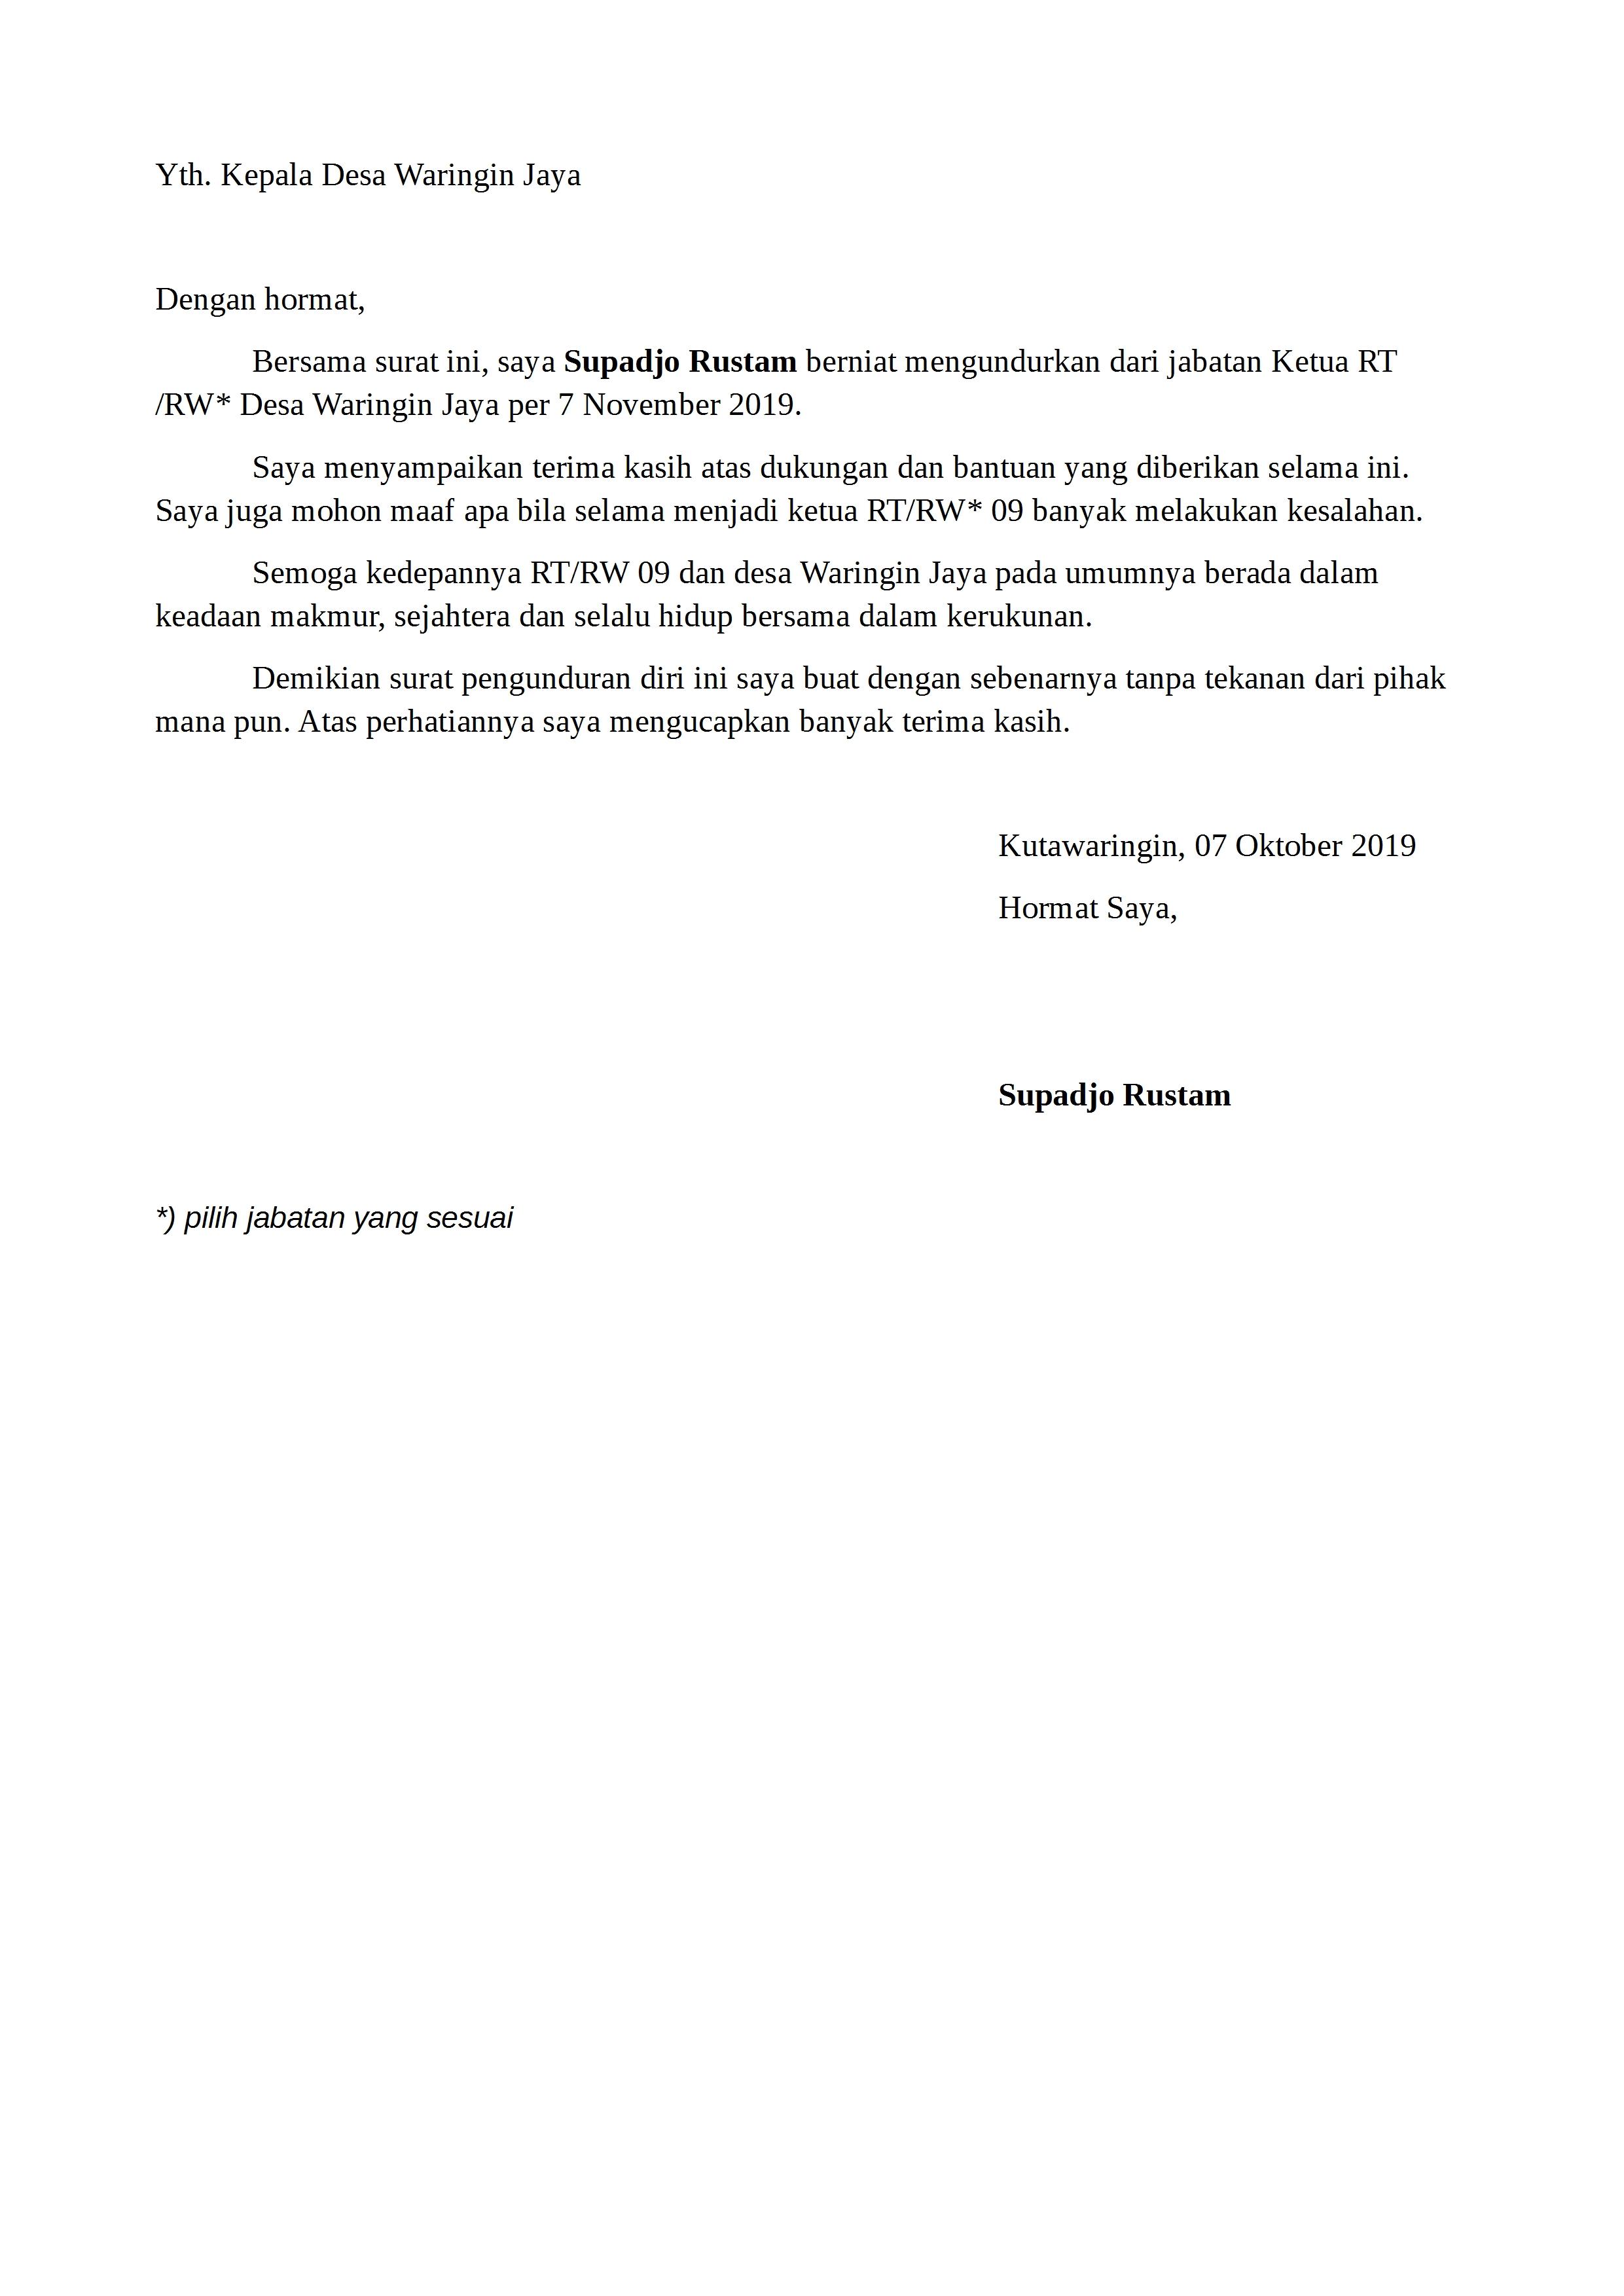 Surat Pengunduran Diri Rt Rw Detiklife